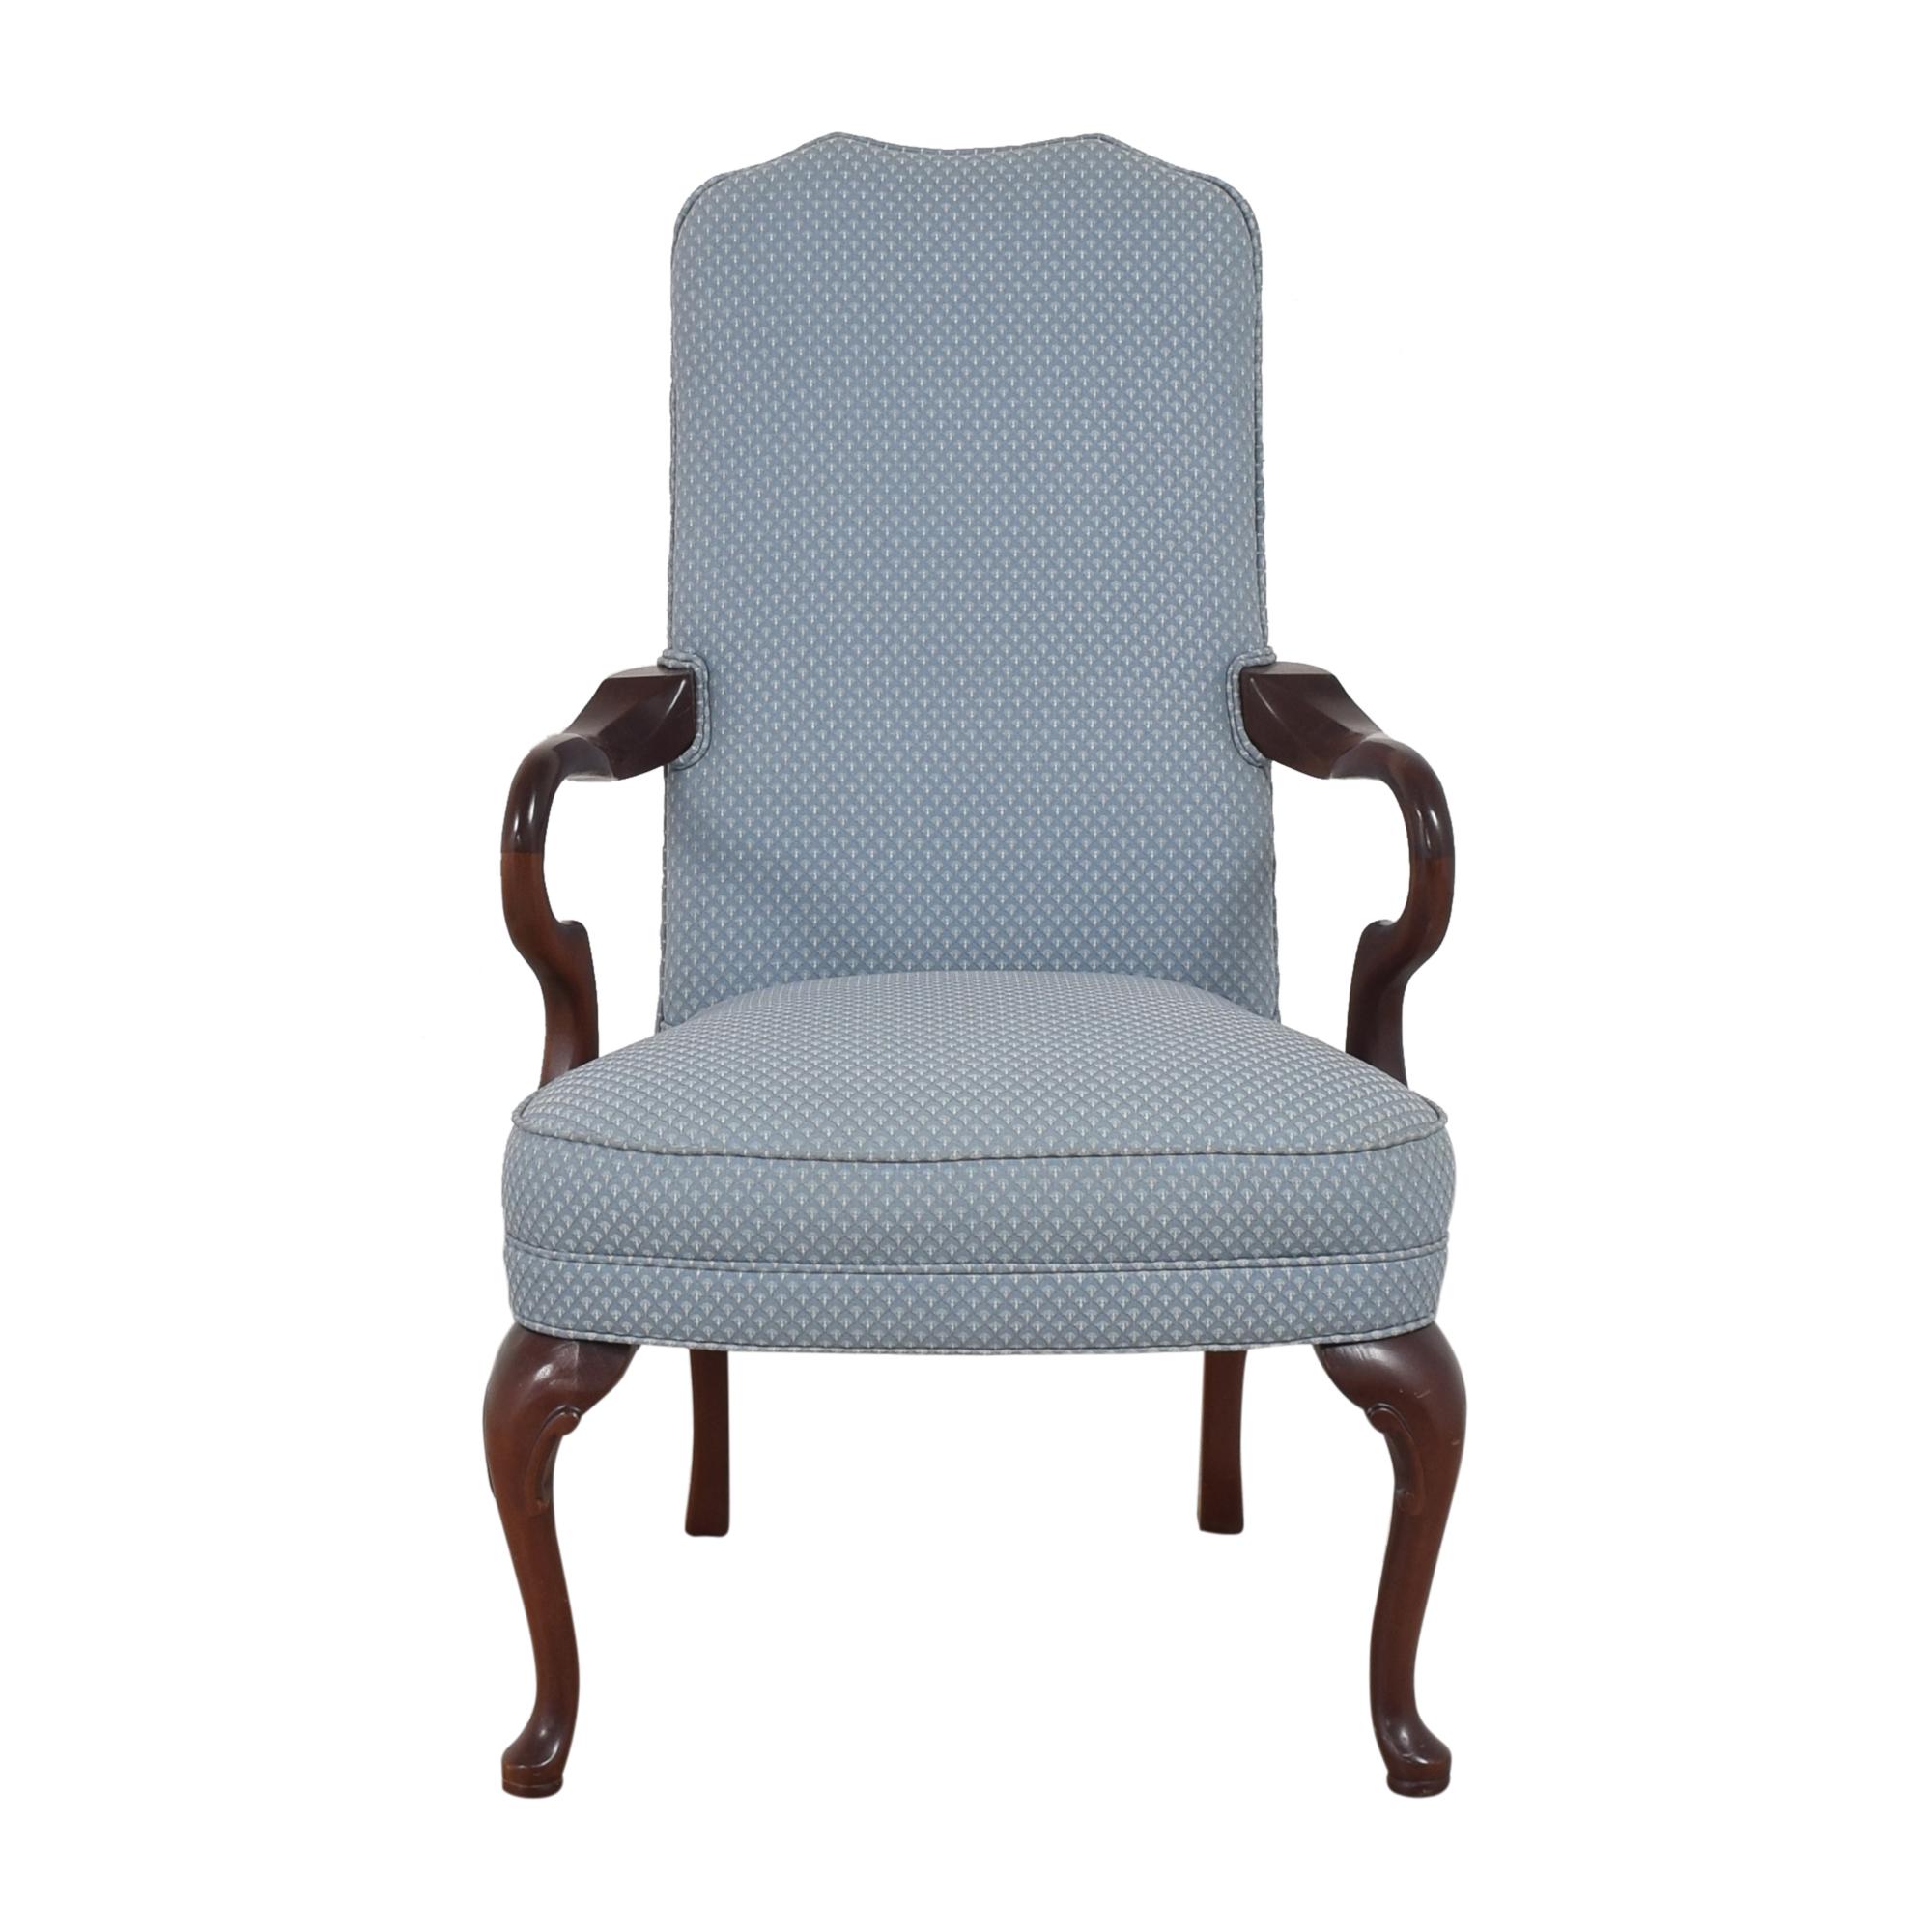 buy Conover Chair Company Louis XIV Arm Chair Conover Chair Company Chairs